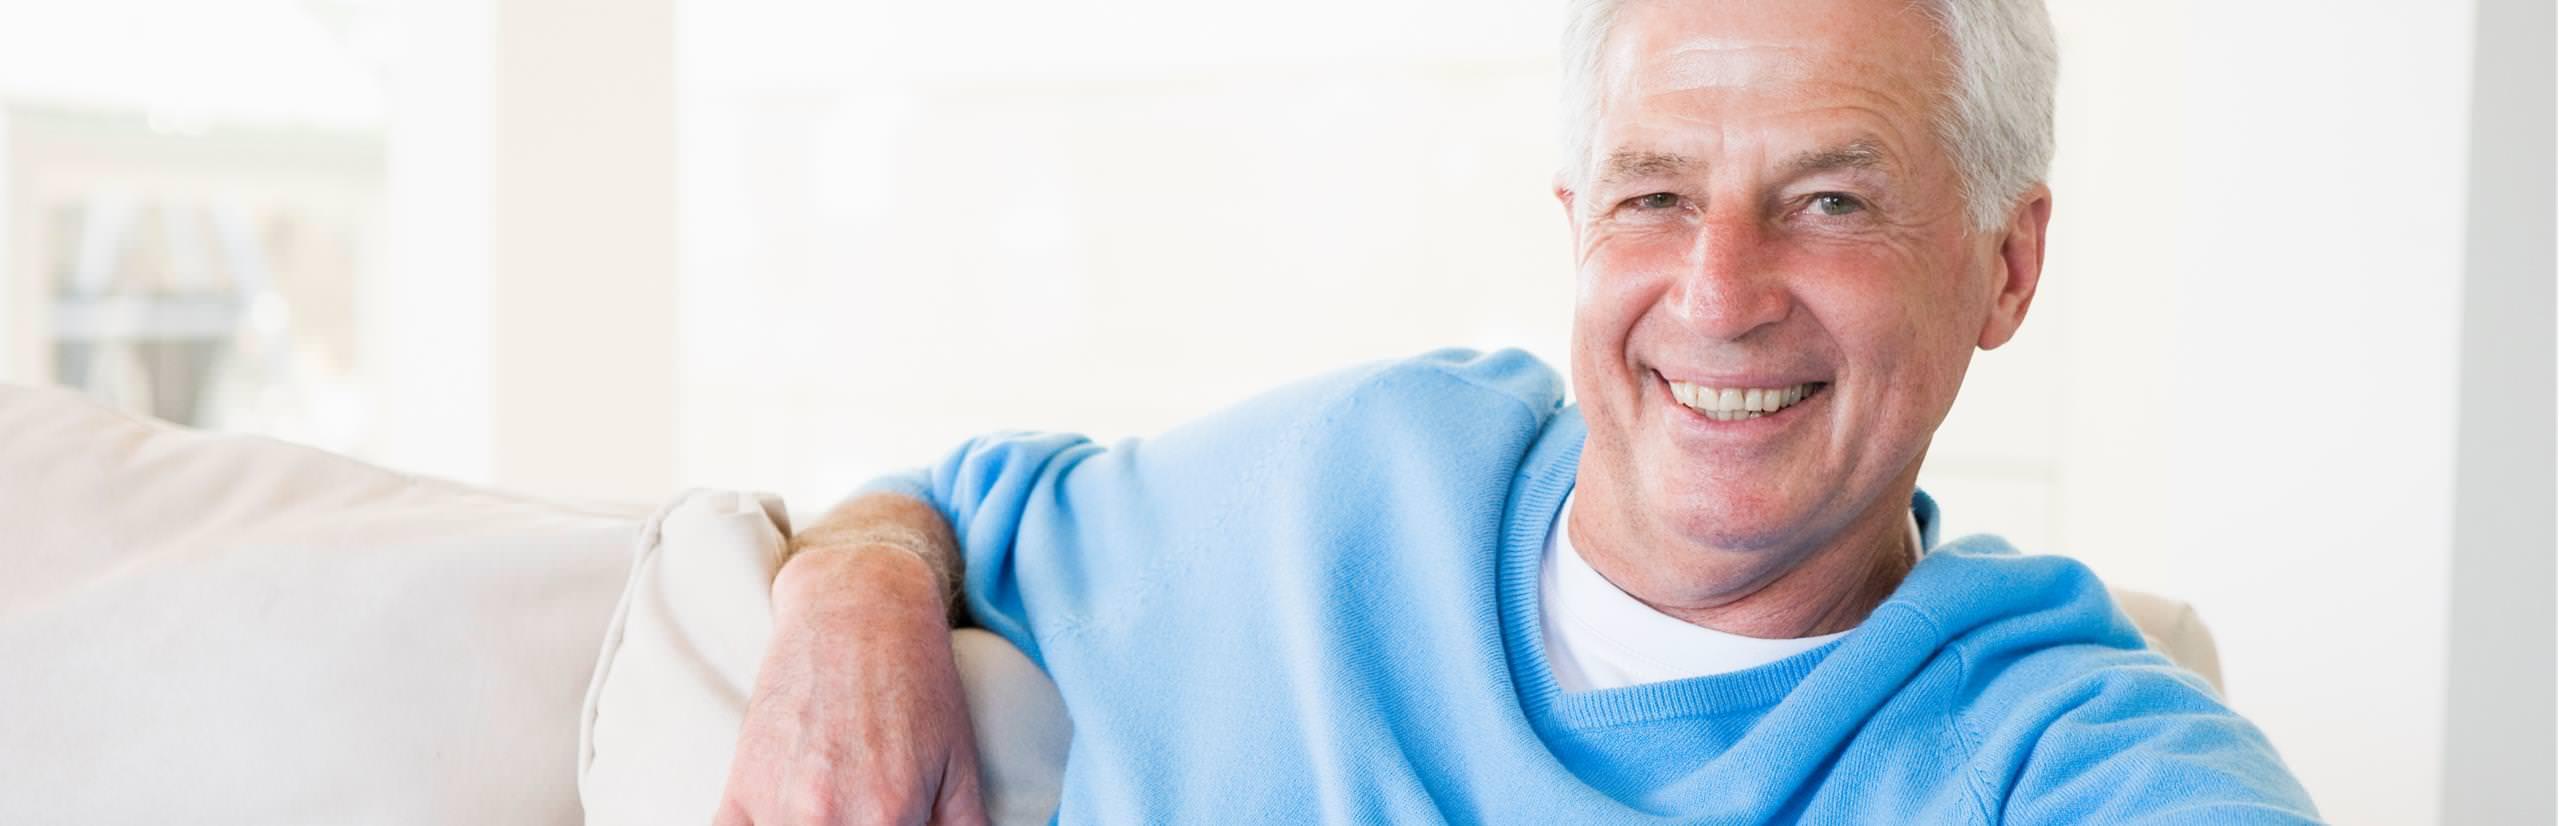 Praxismarketing Zahnarzt Implantologie Implantatpatienten